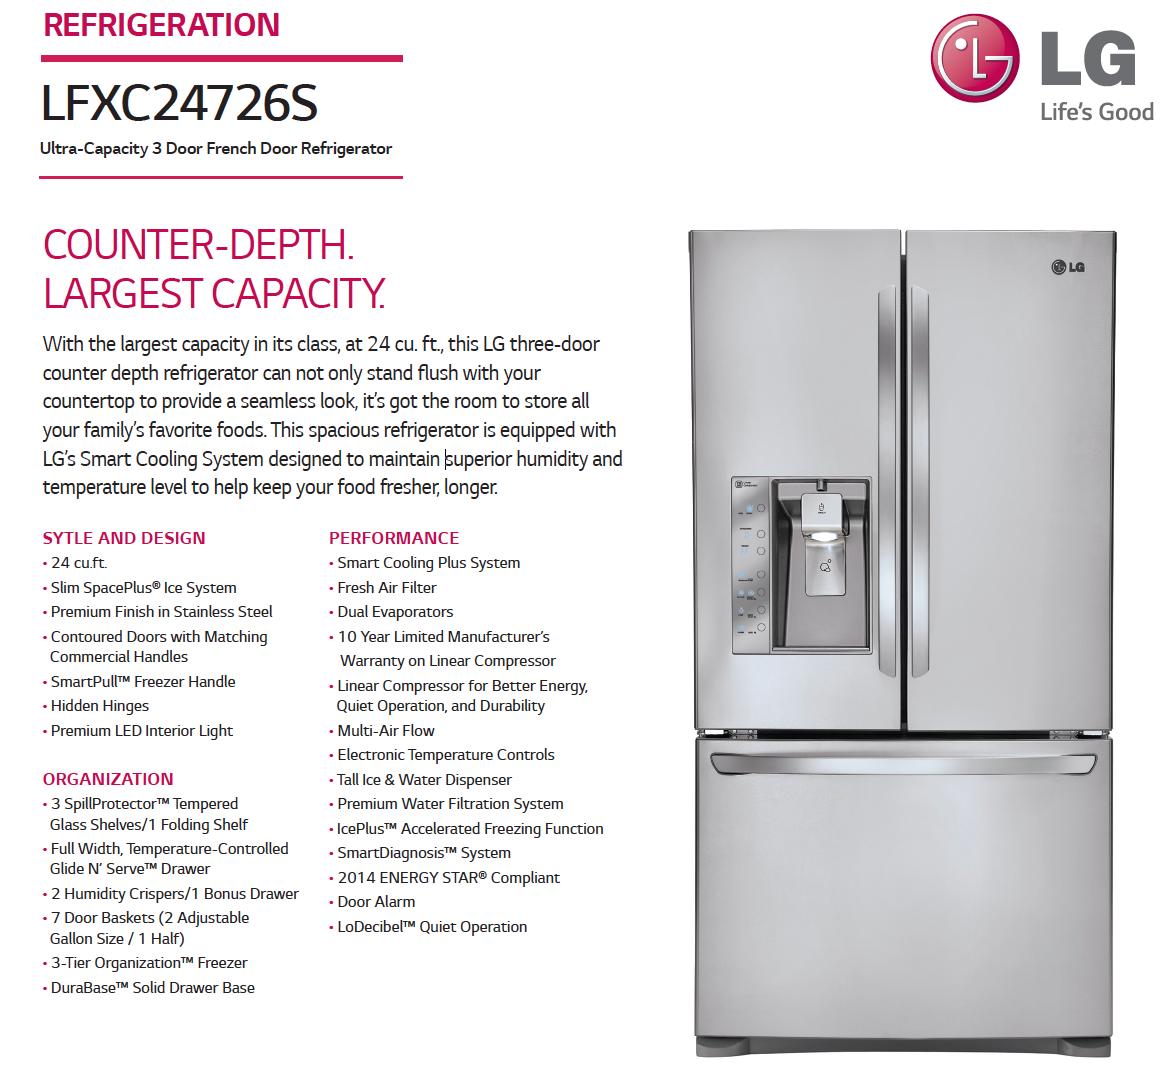 Lfxc24726s | Refrigerator | Counter depth refrigerator